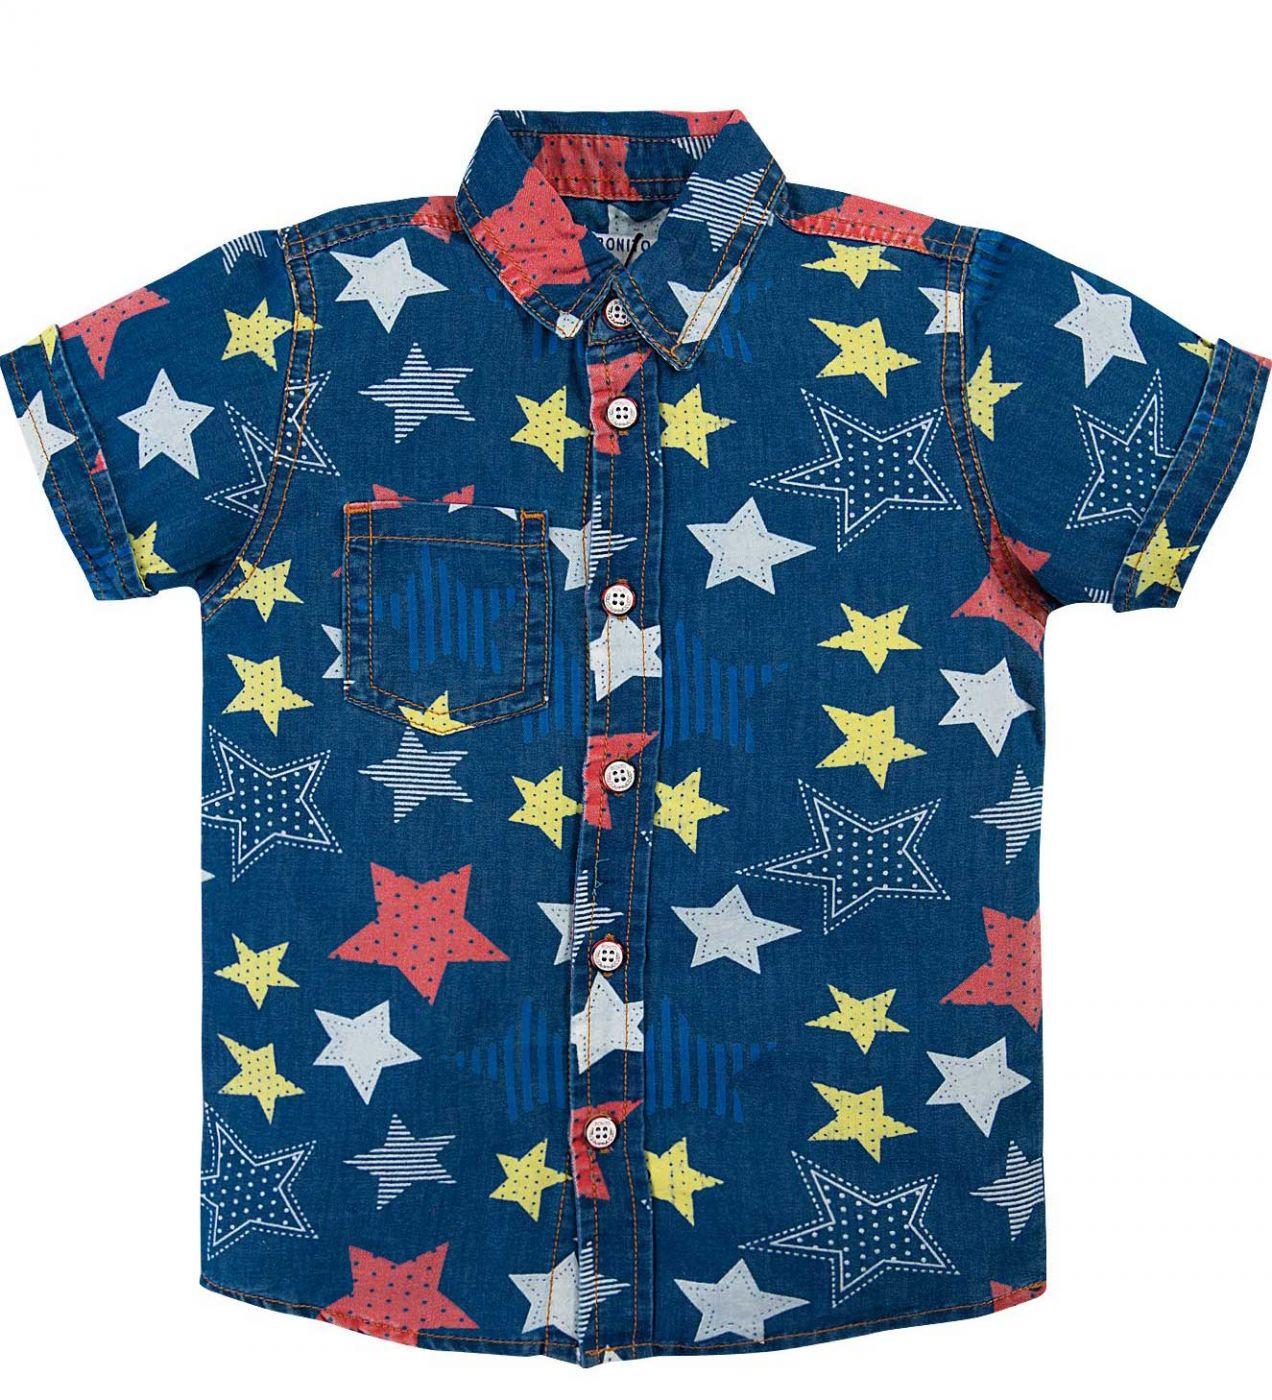 Джинсовая рубашка для мальчика Bonito Jeans синий со звездами